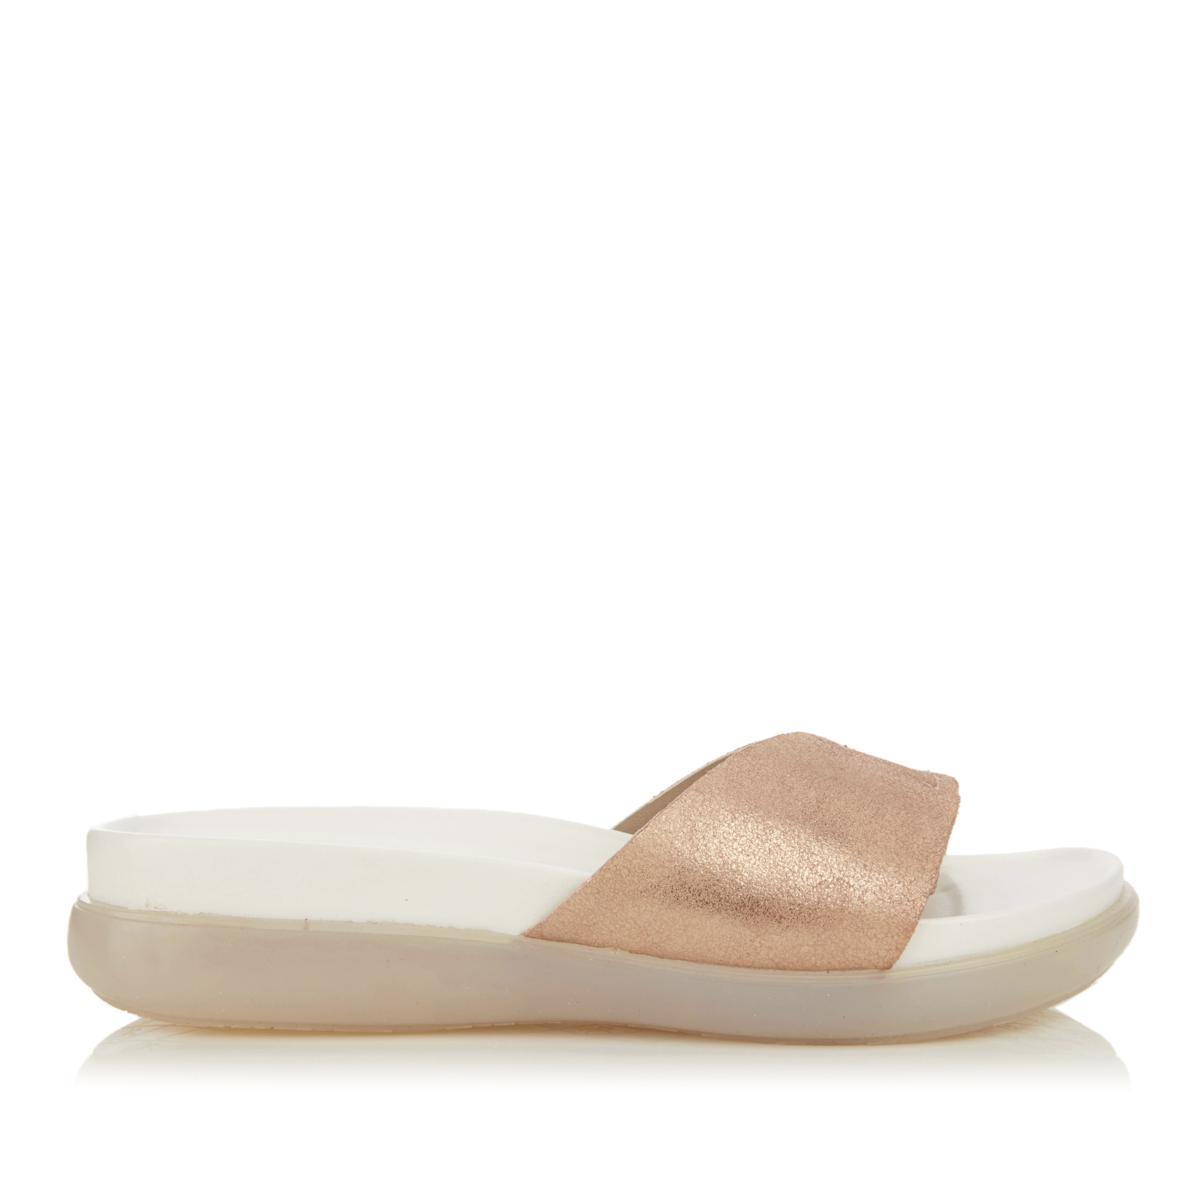 16e200557f3 Details about Donald J Pliner Womens Hollie Leather Open Toe Casual Slide  Sandals